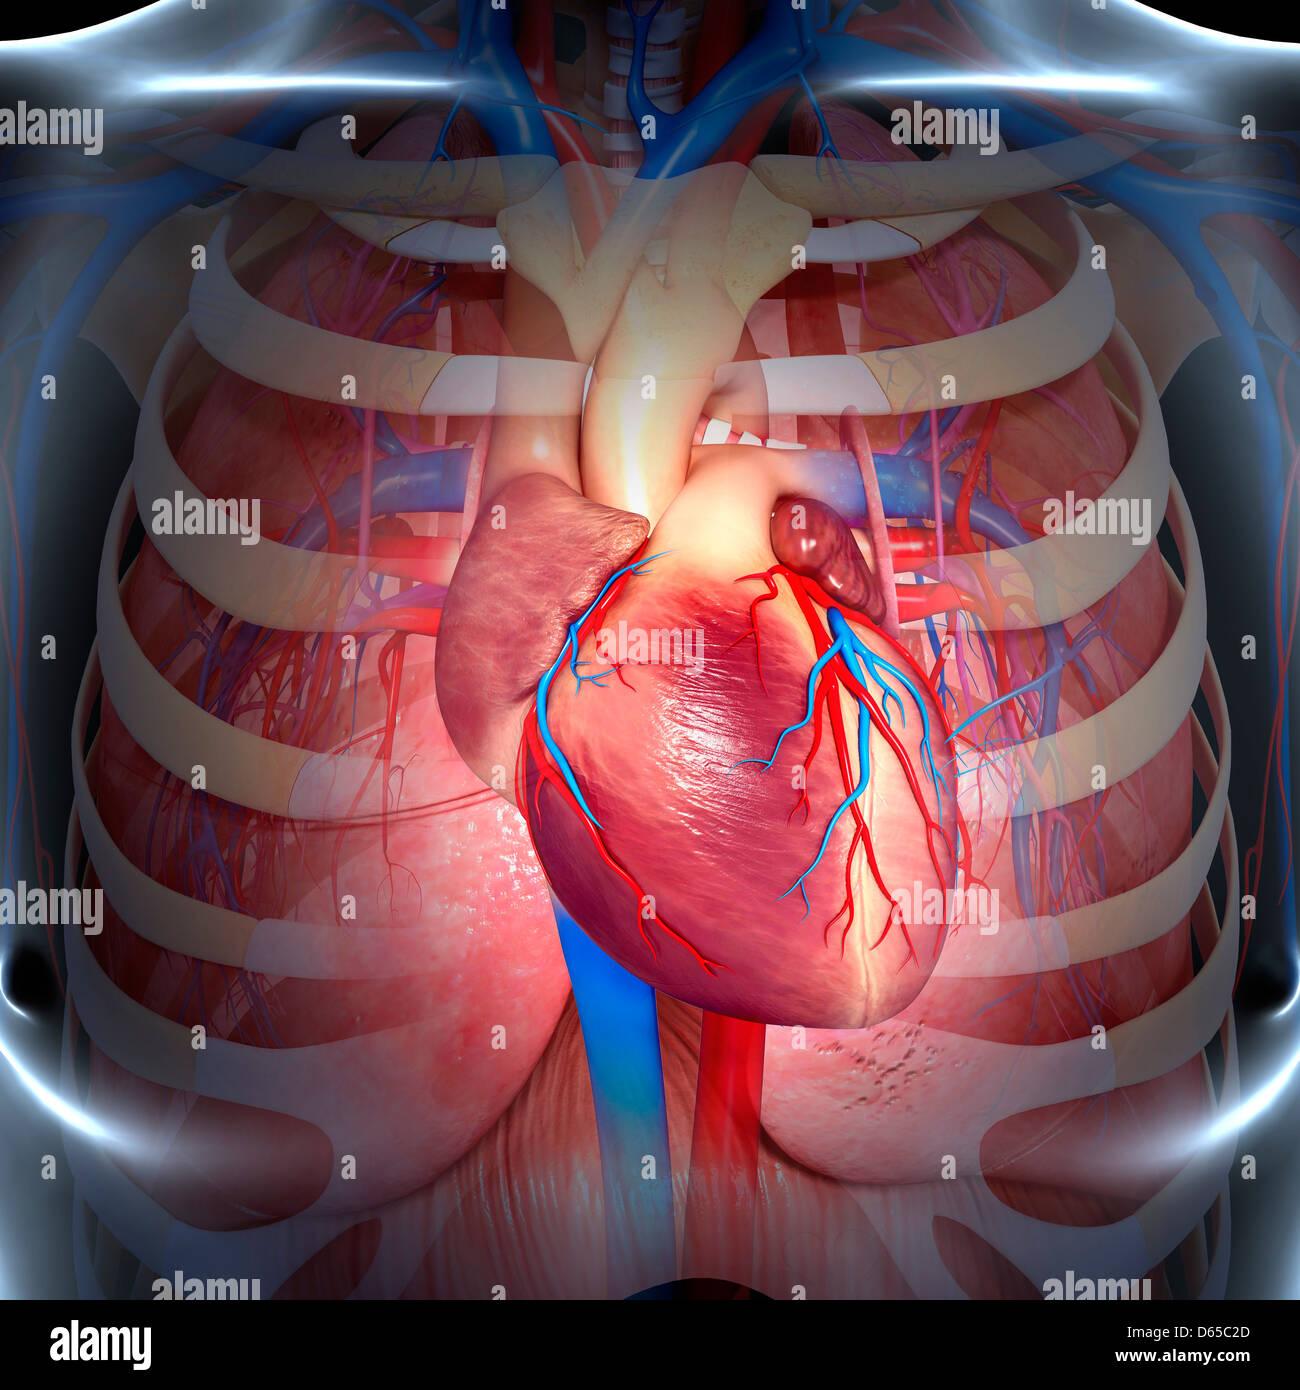 Chest anatomy, artwork Stock Photo: 55438277 - Alamy